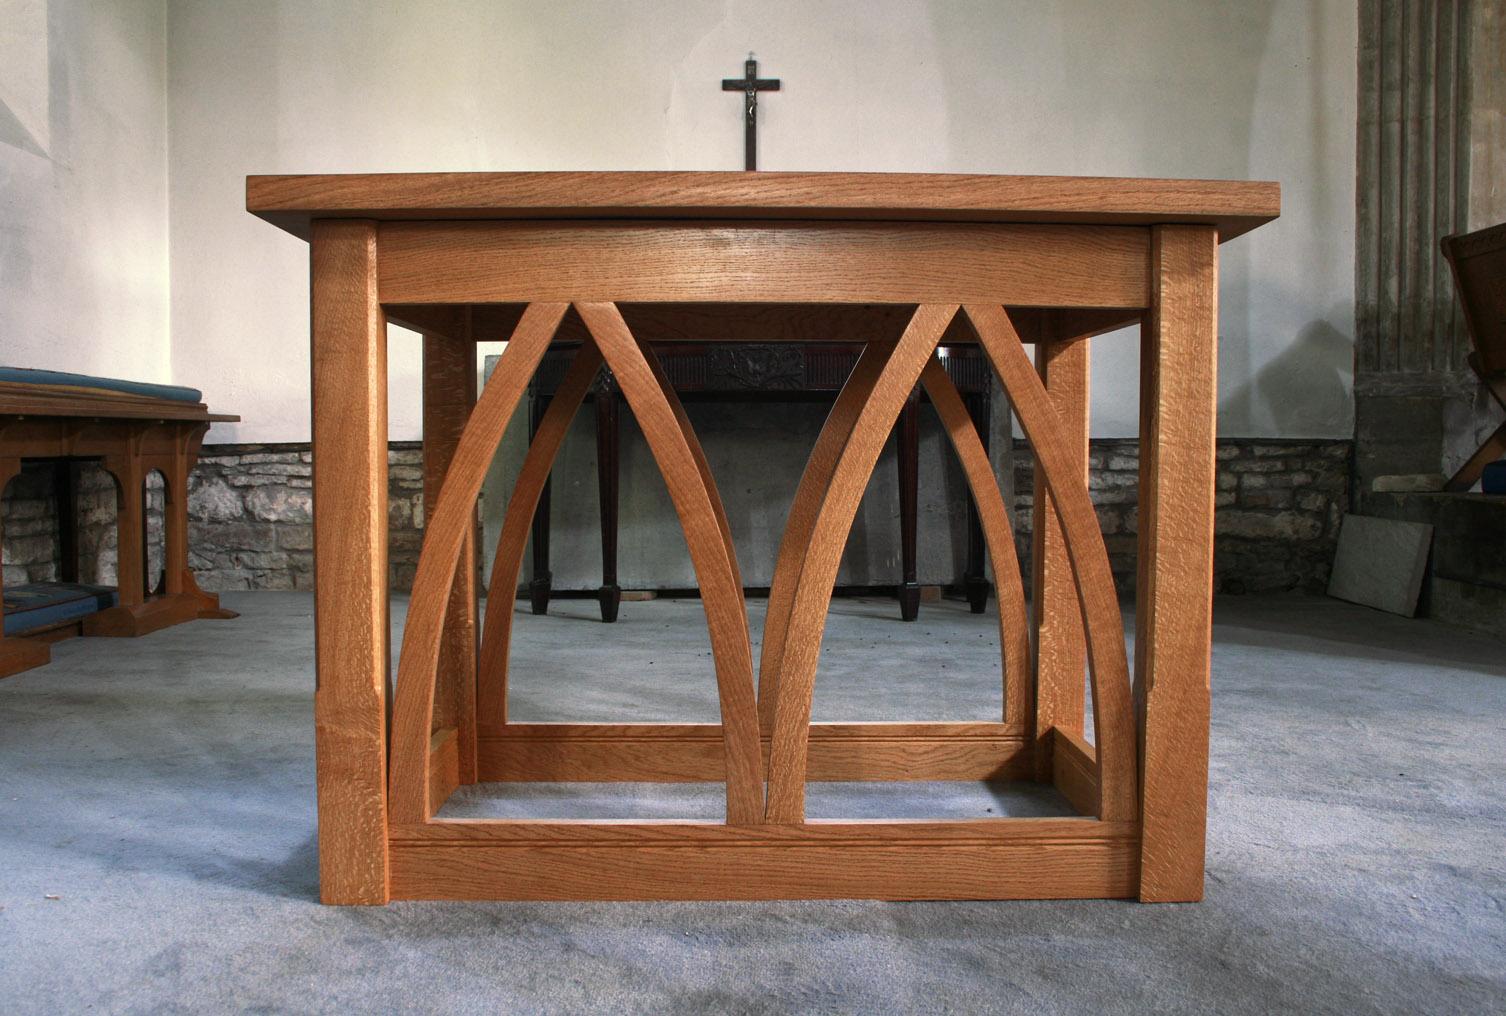 English oak altar somerset, arbor furniture